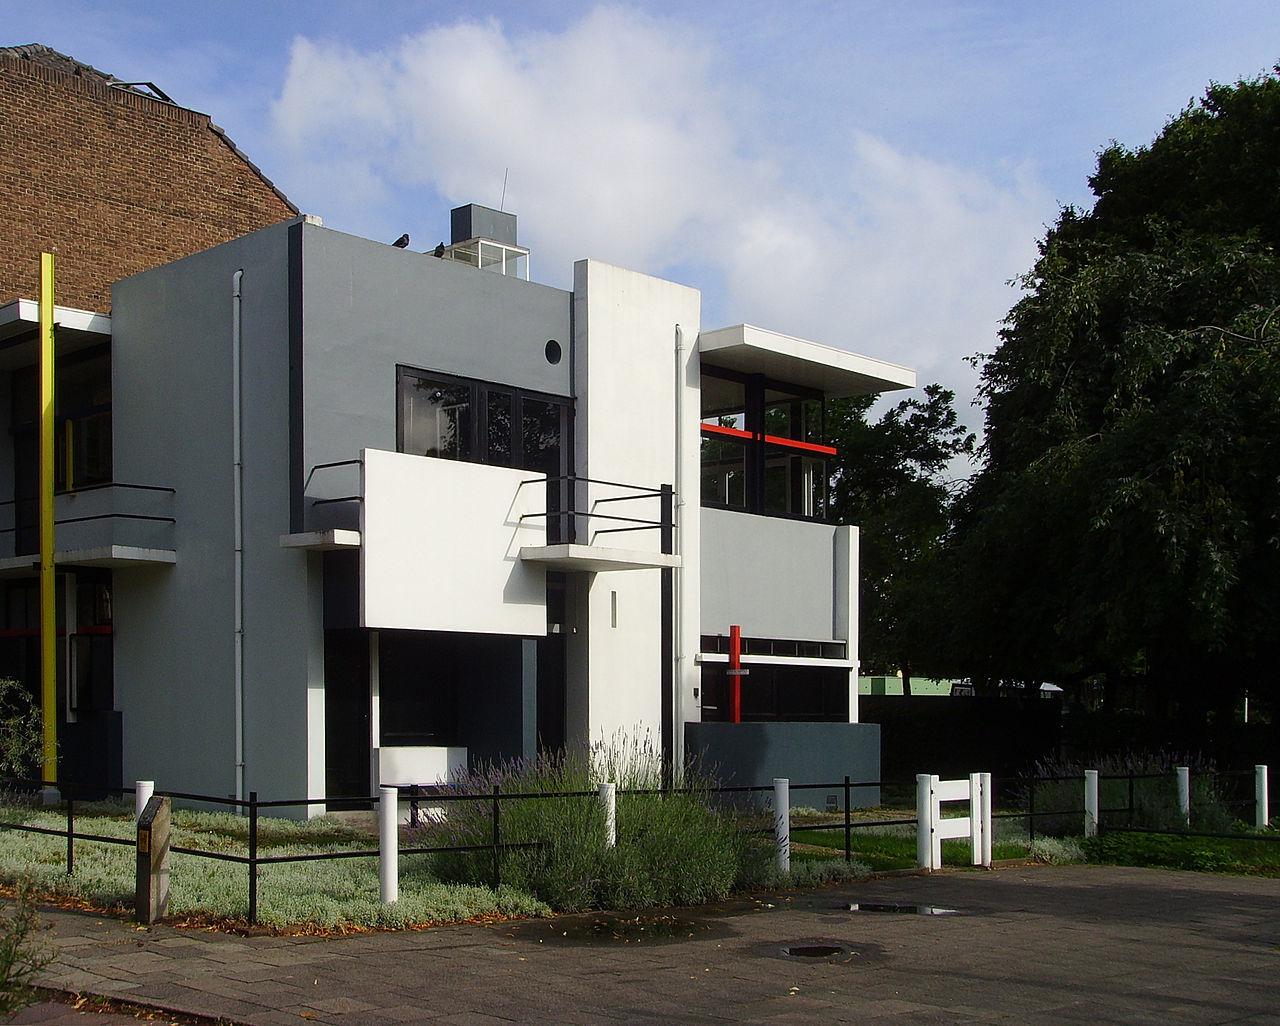 Rietveld-SchroderhuisUtrechttheNetherlands.jpg